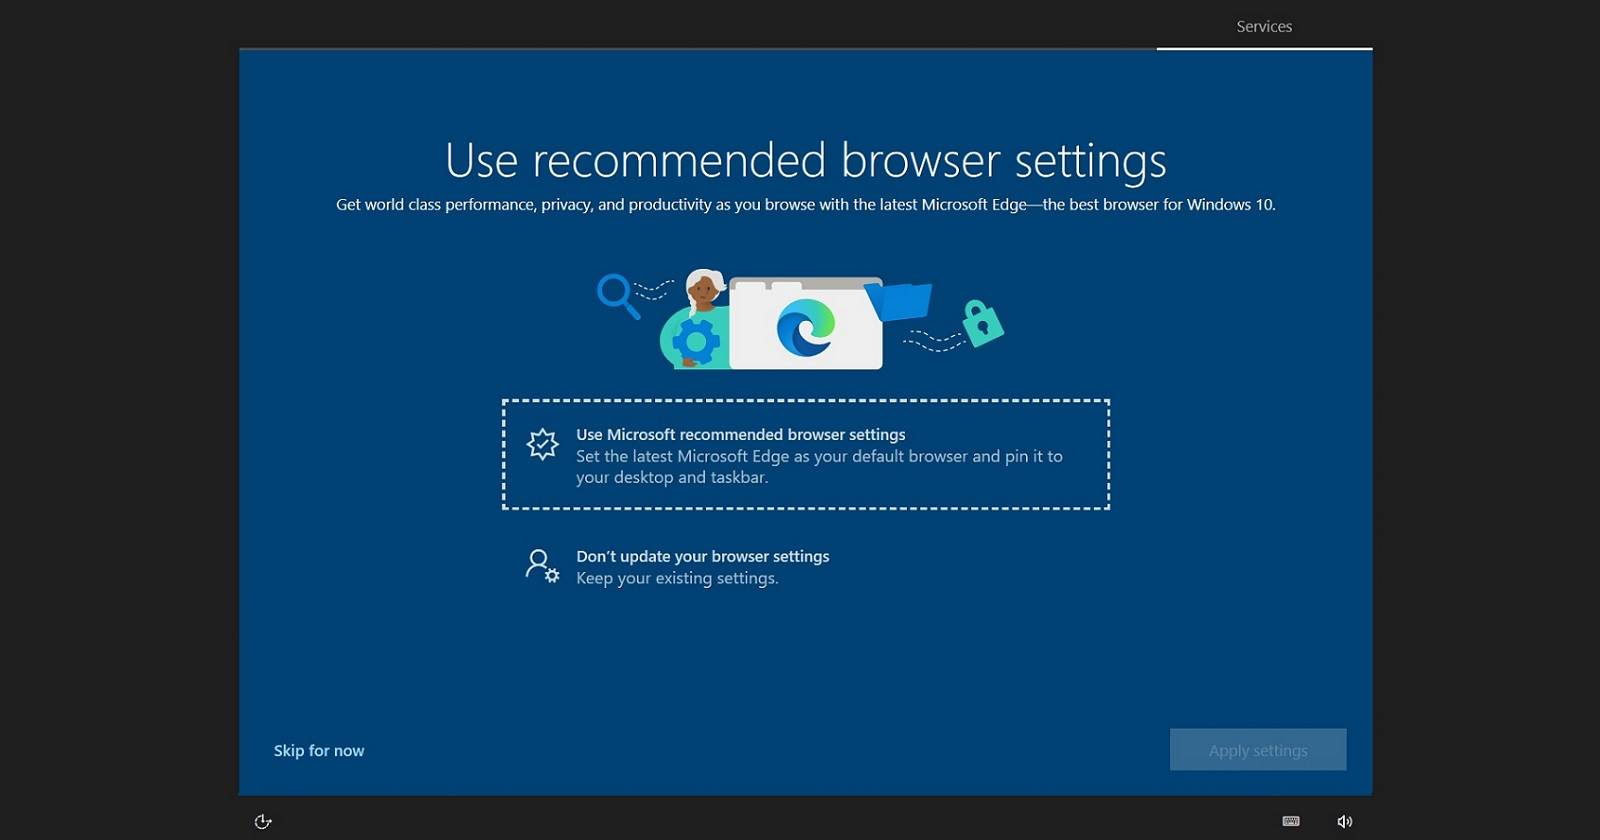 microsoft edge windows 10 ads reklama